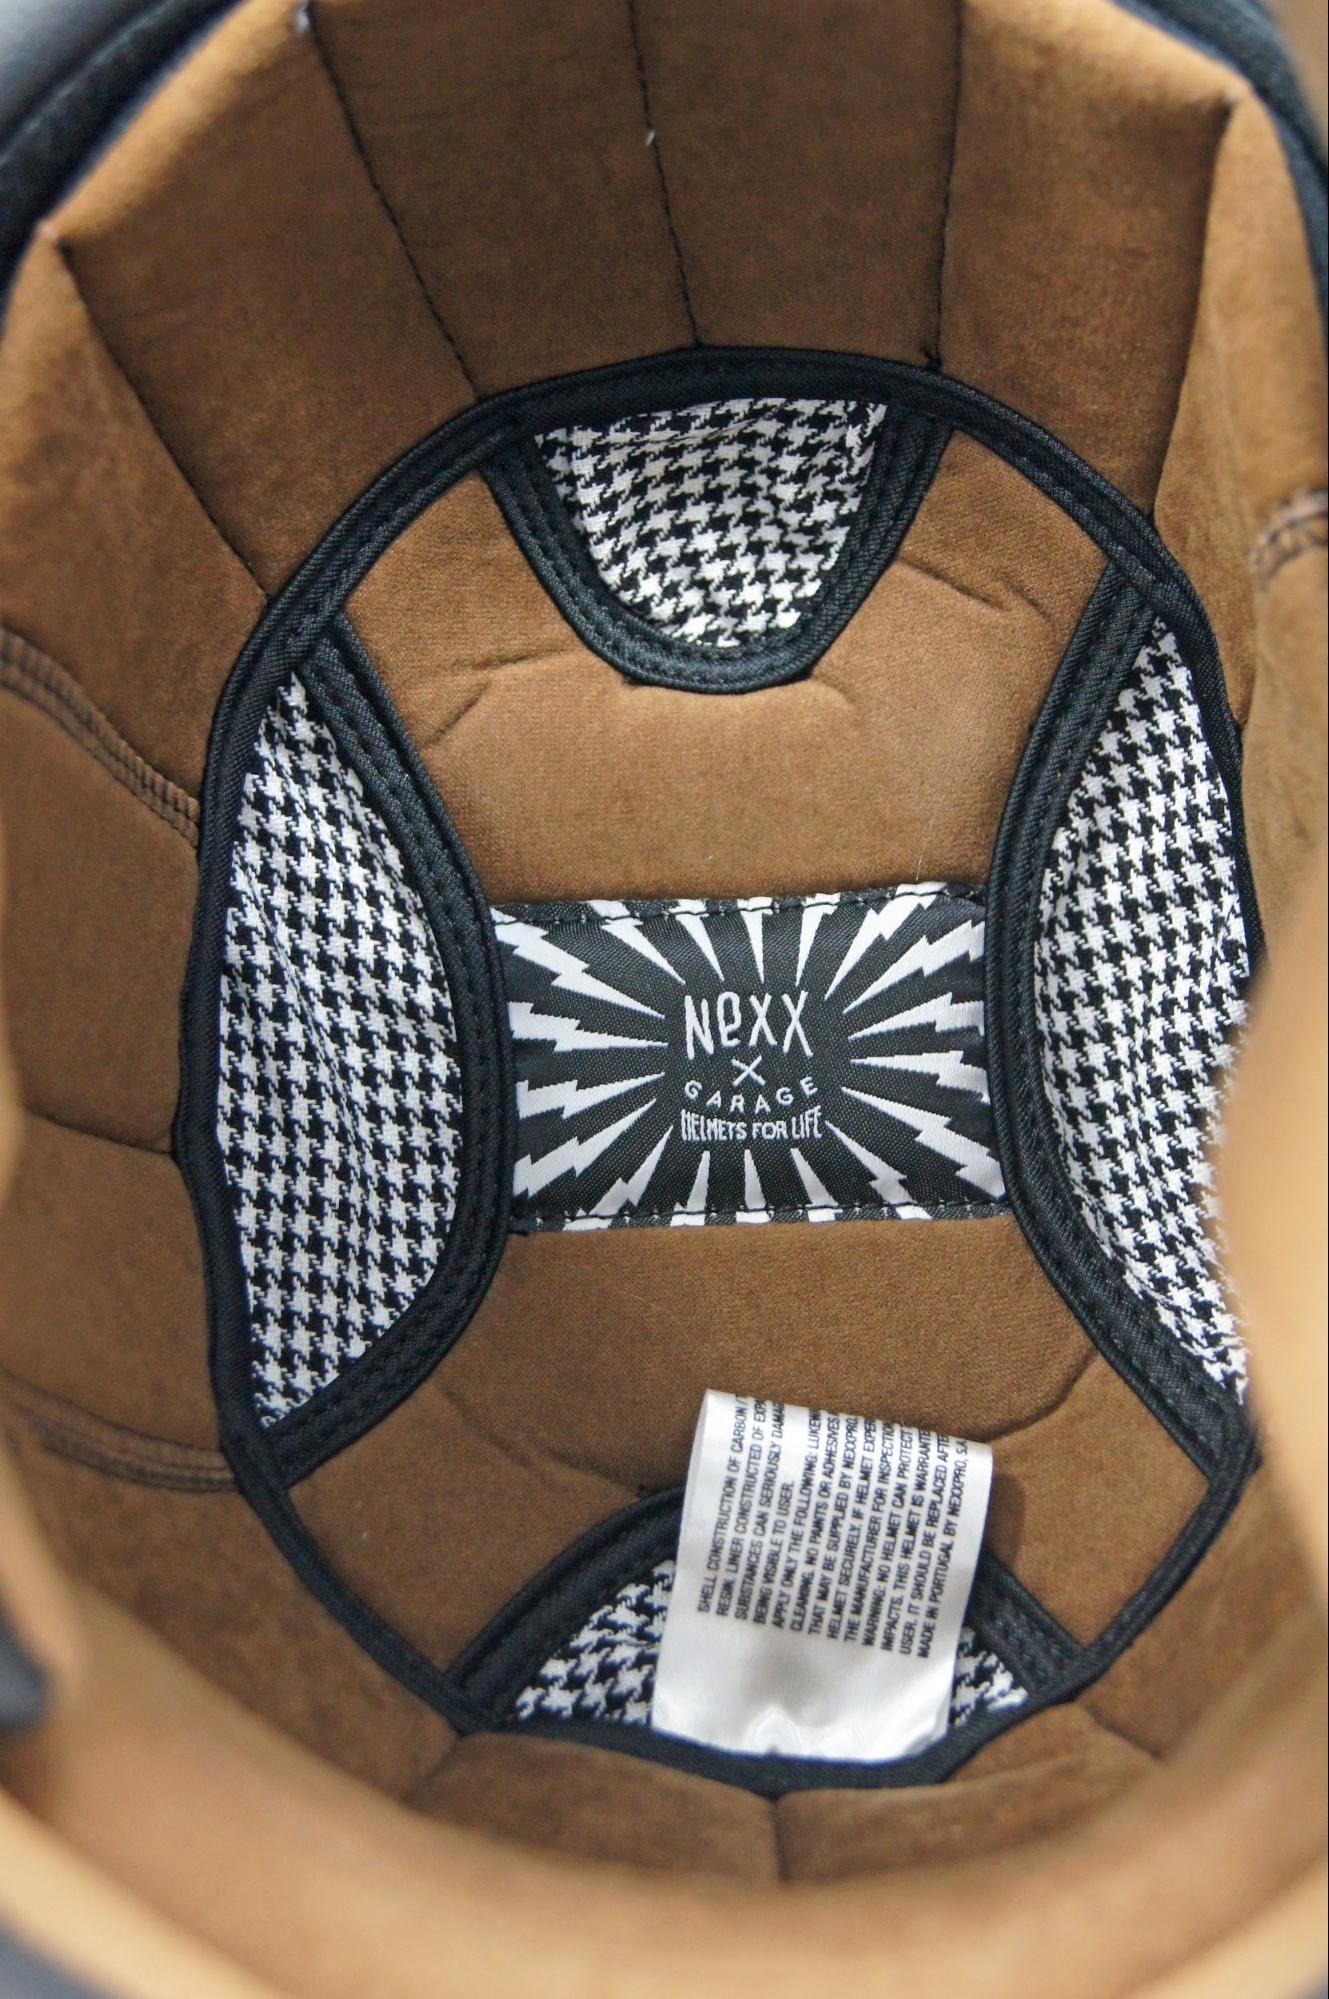 NEXX X.G100 Racer Motordrome Helmet interior closeup